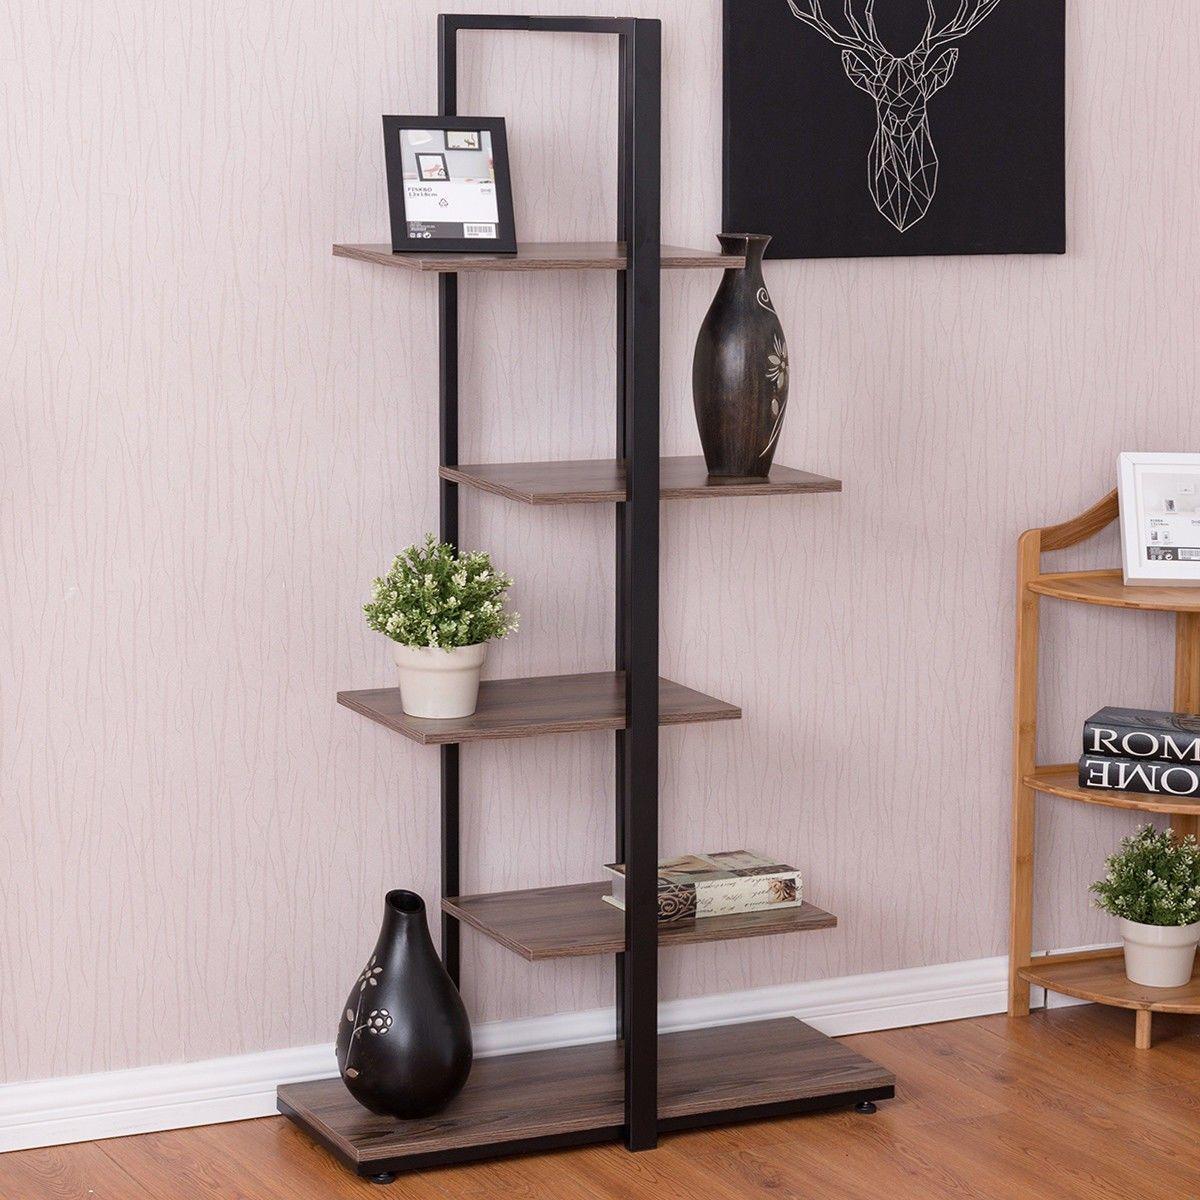 60 Modern Open Concept Display Etagere Shelf Living Room